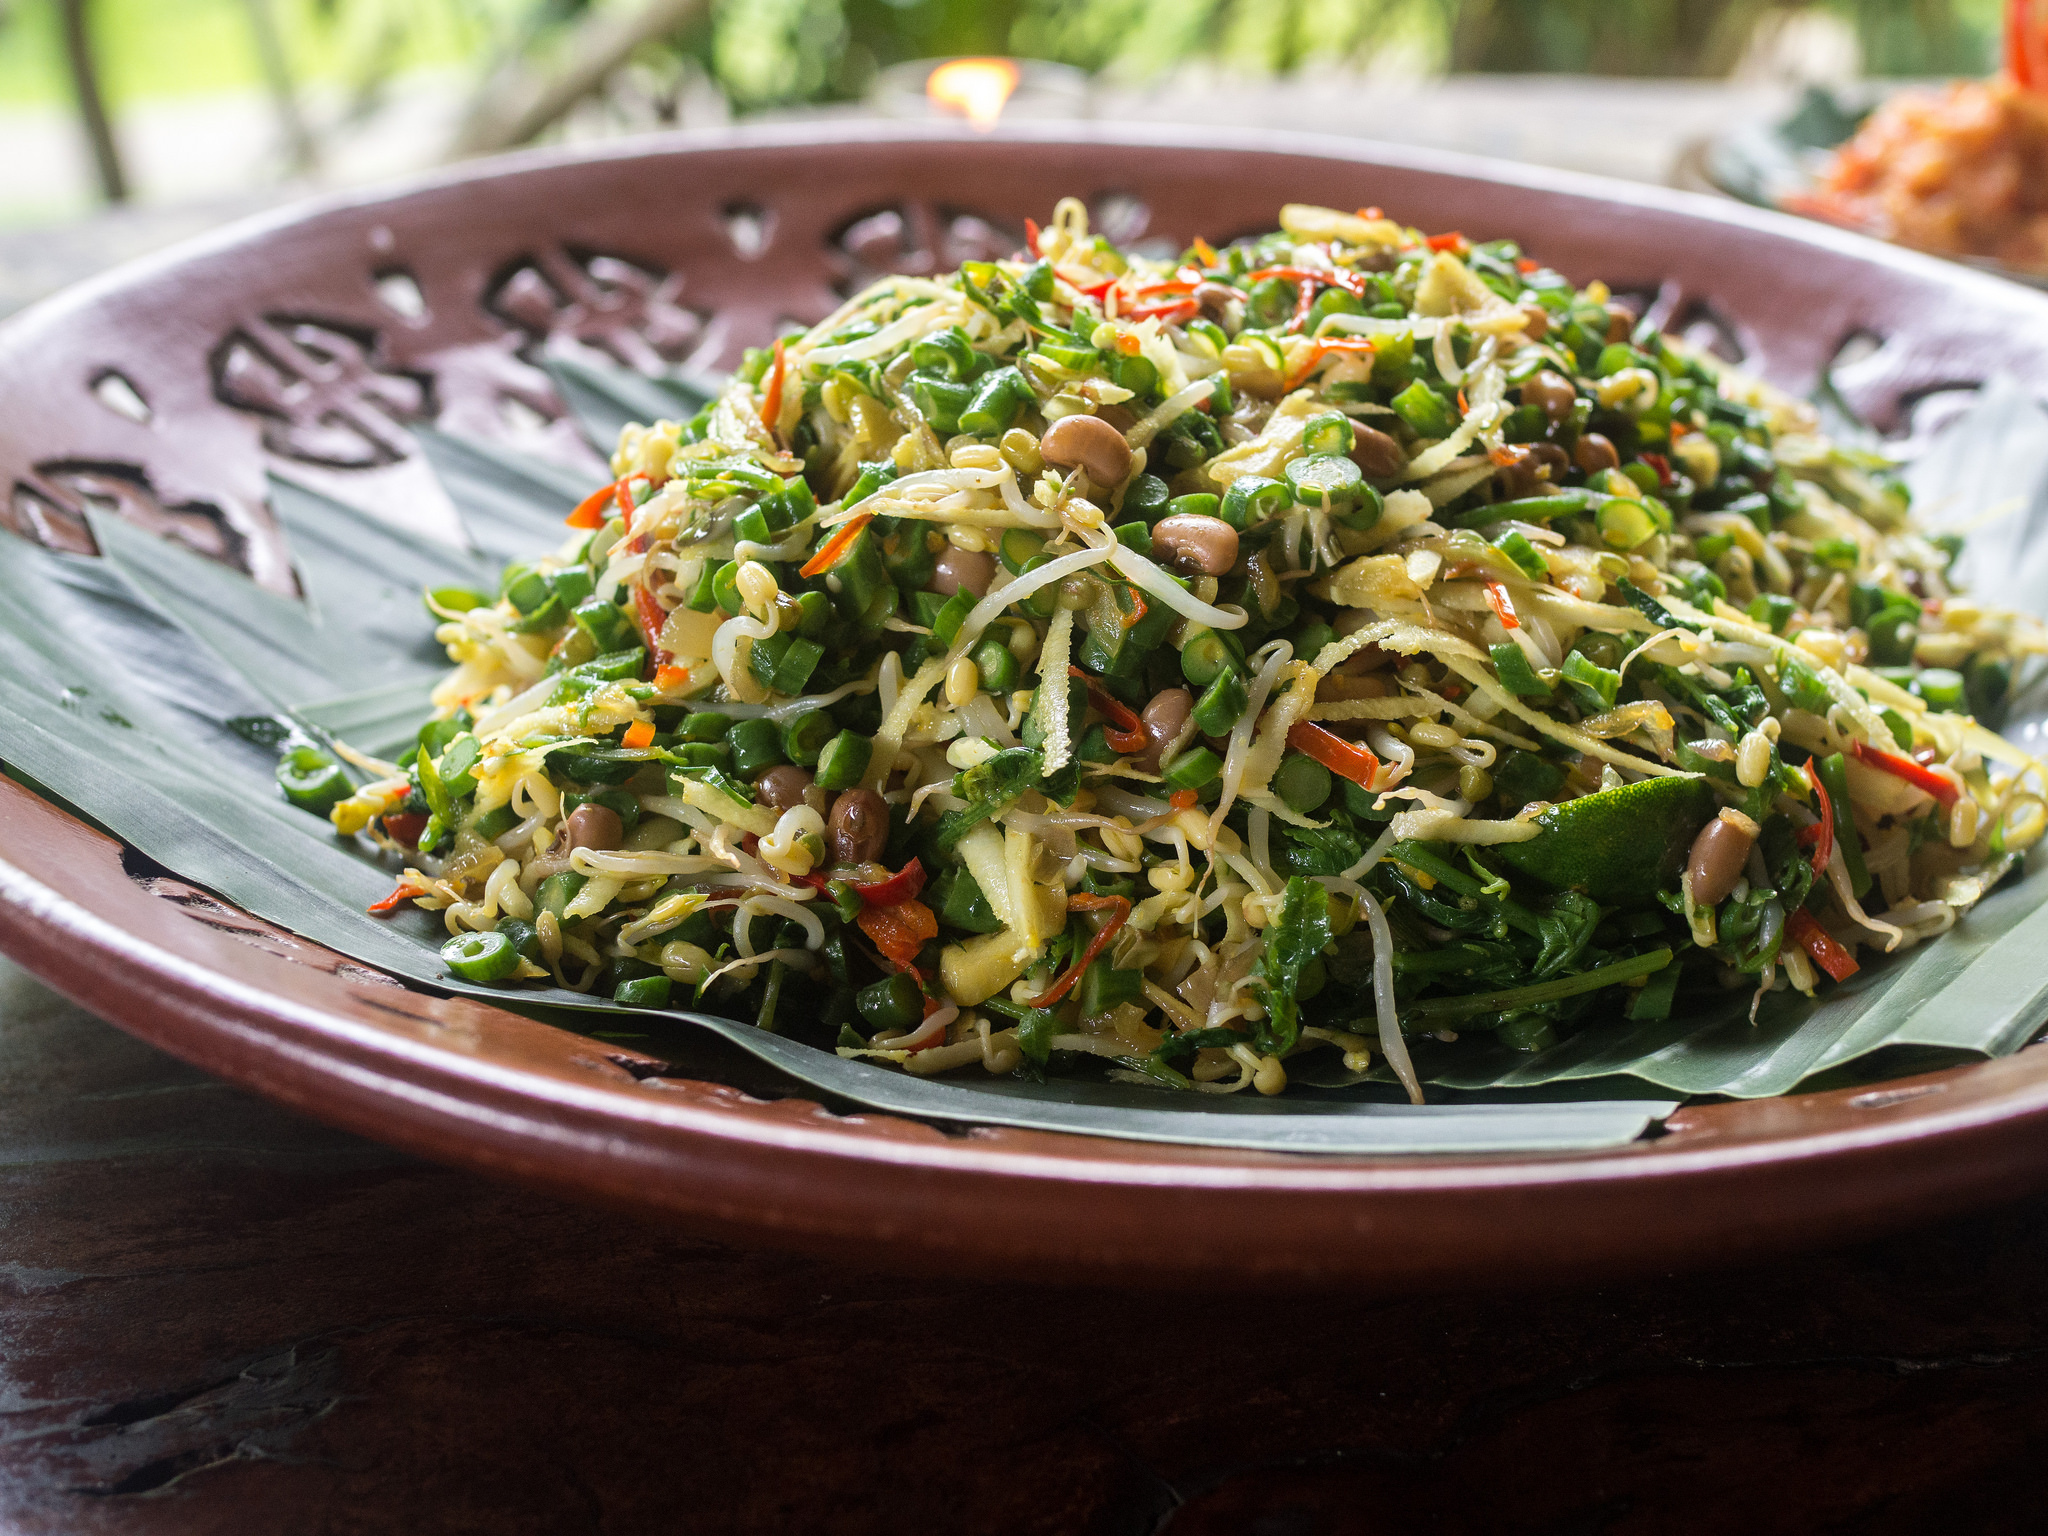 balinese-urab-salad bali subak cooking.jpg